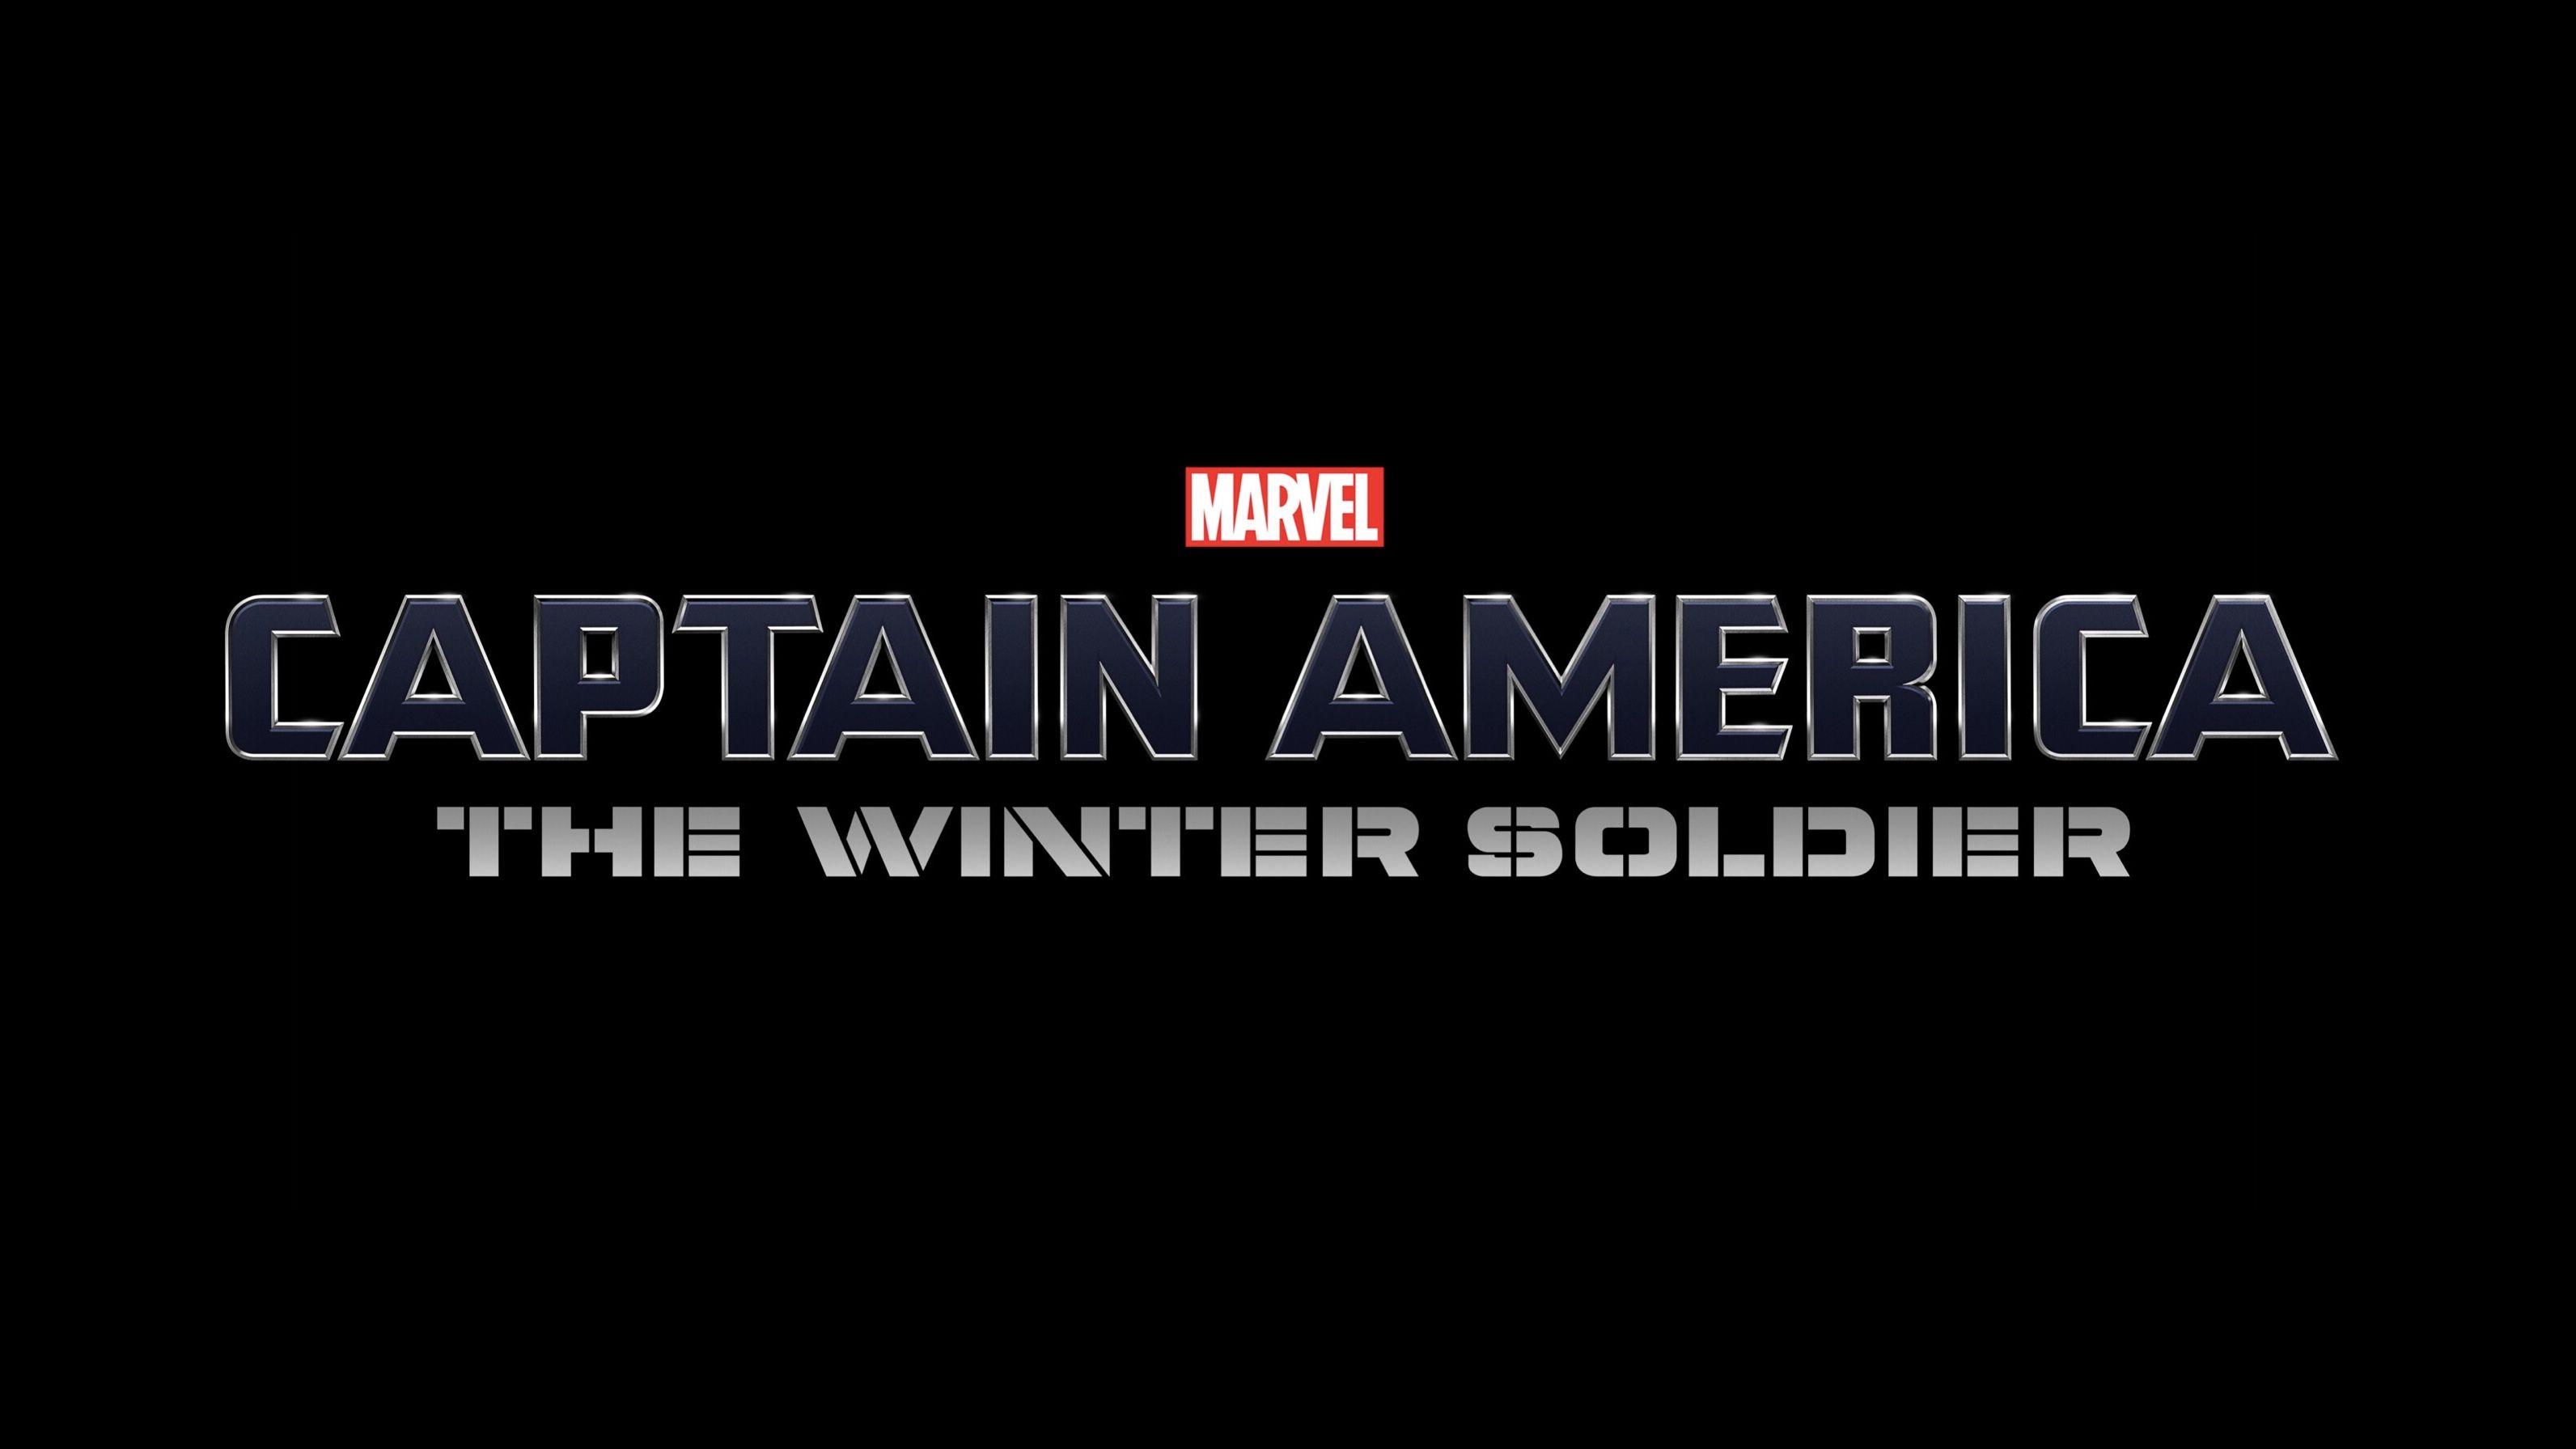 Captain America The Winter Soldier Logo Marvel captain